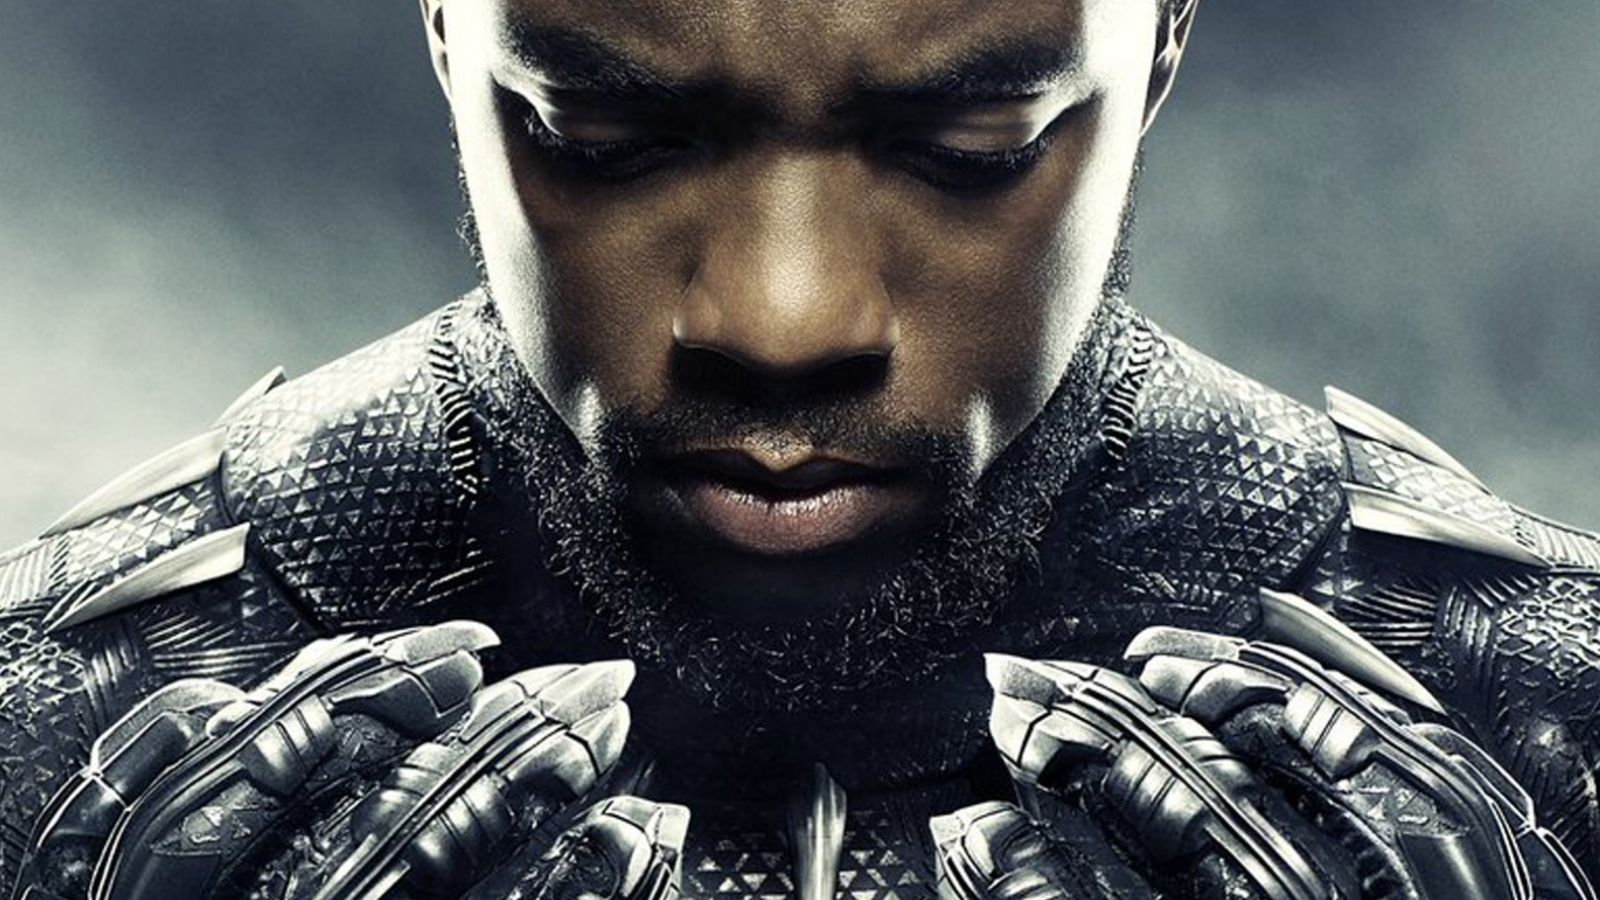 «Black Panther»: Το βασίλειο της Γουακάντα γίνεται τηλεοπτική σειρά